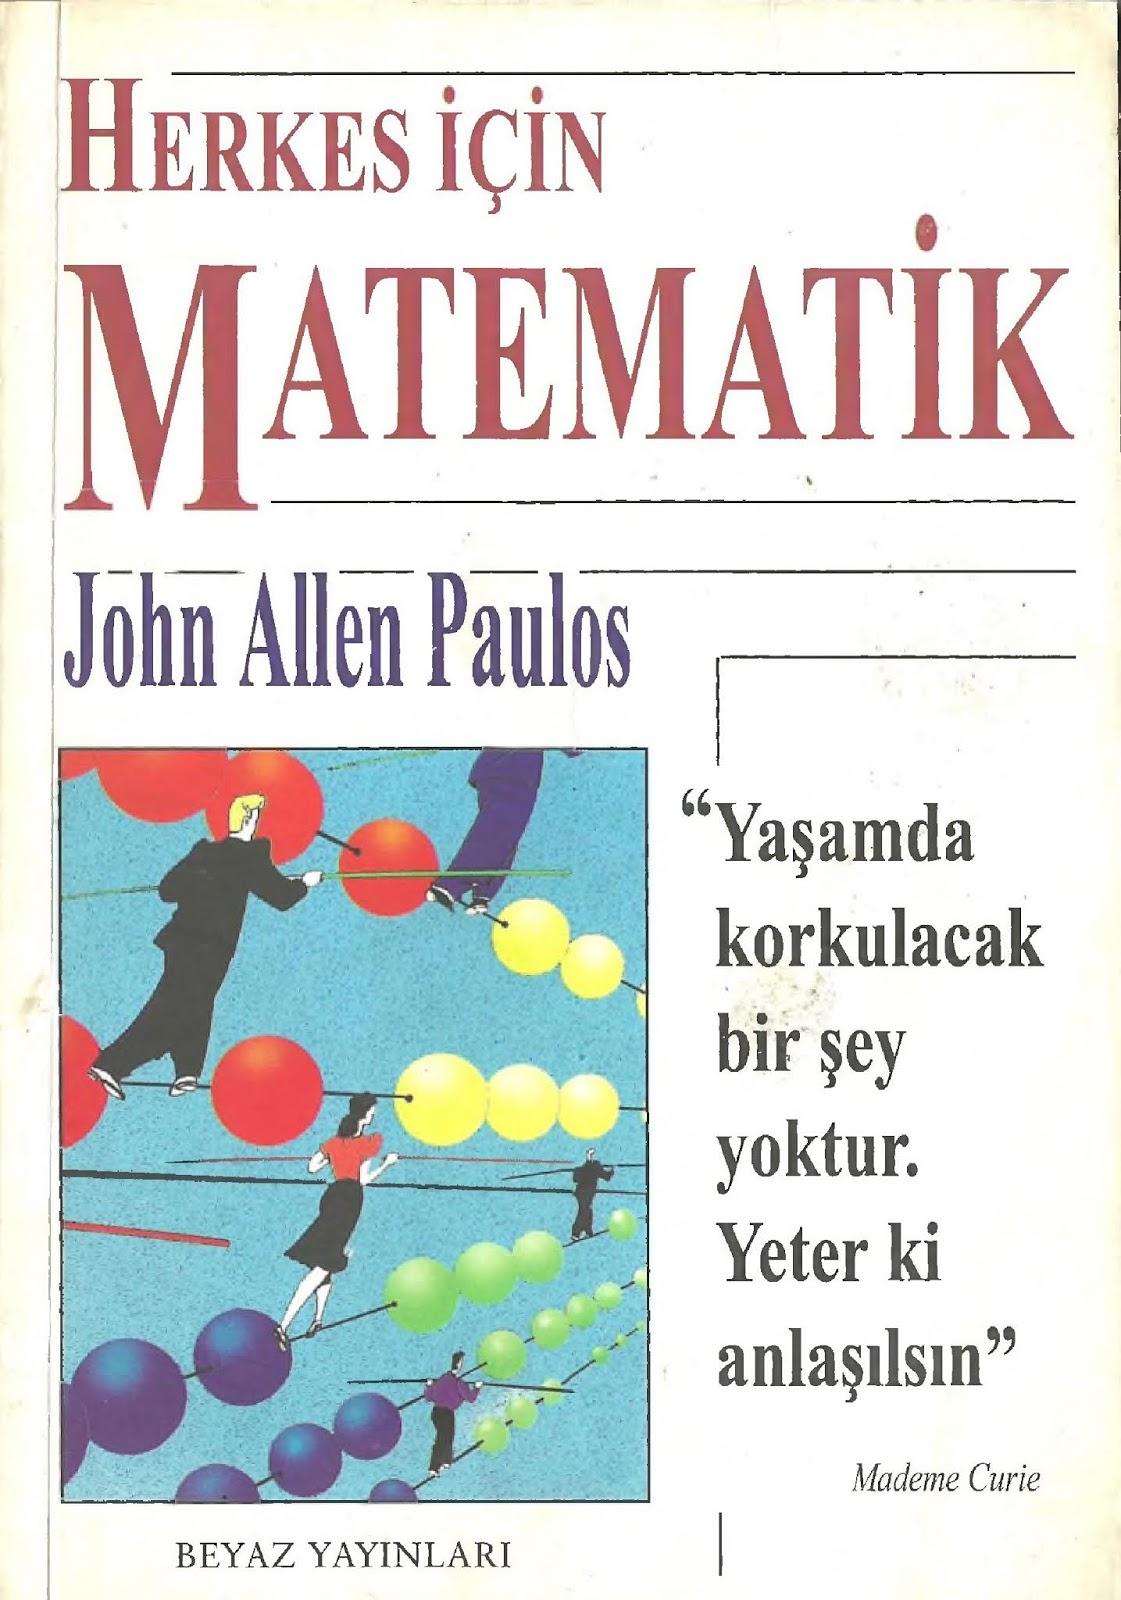 John Allen Paulos. Herkes İçin Matematik (1998)